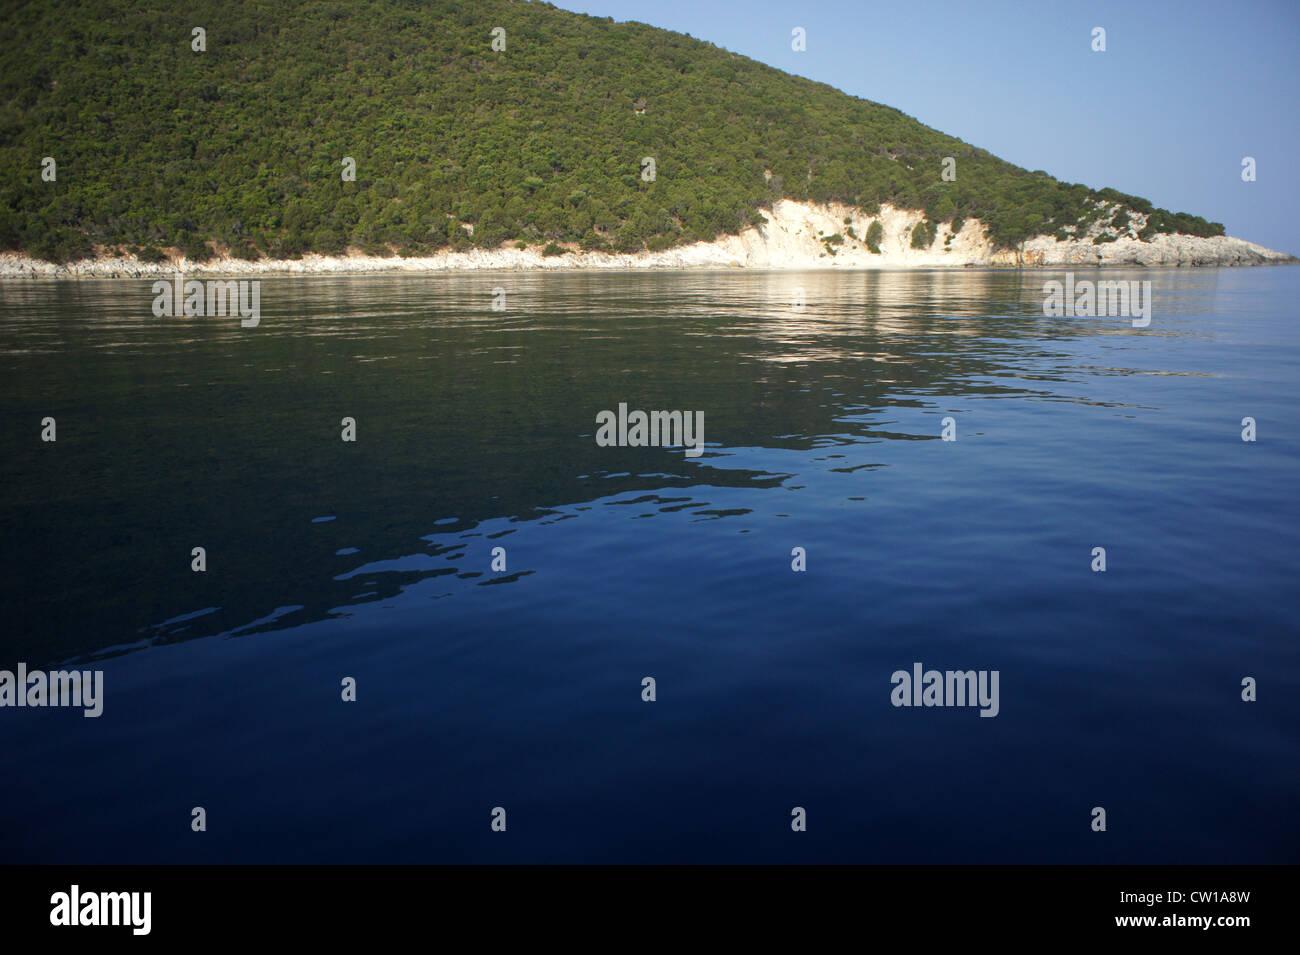 Northern Ithaca coastline, Ionian Sea, Greece. - Stock Image